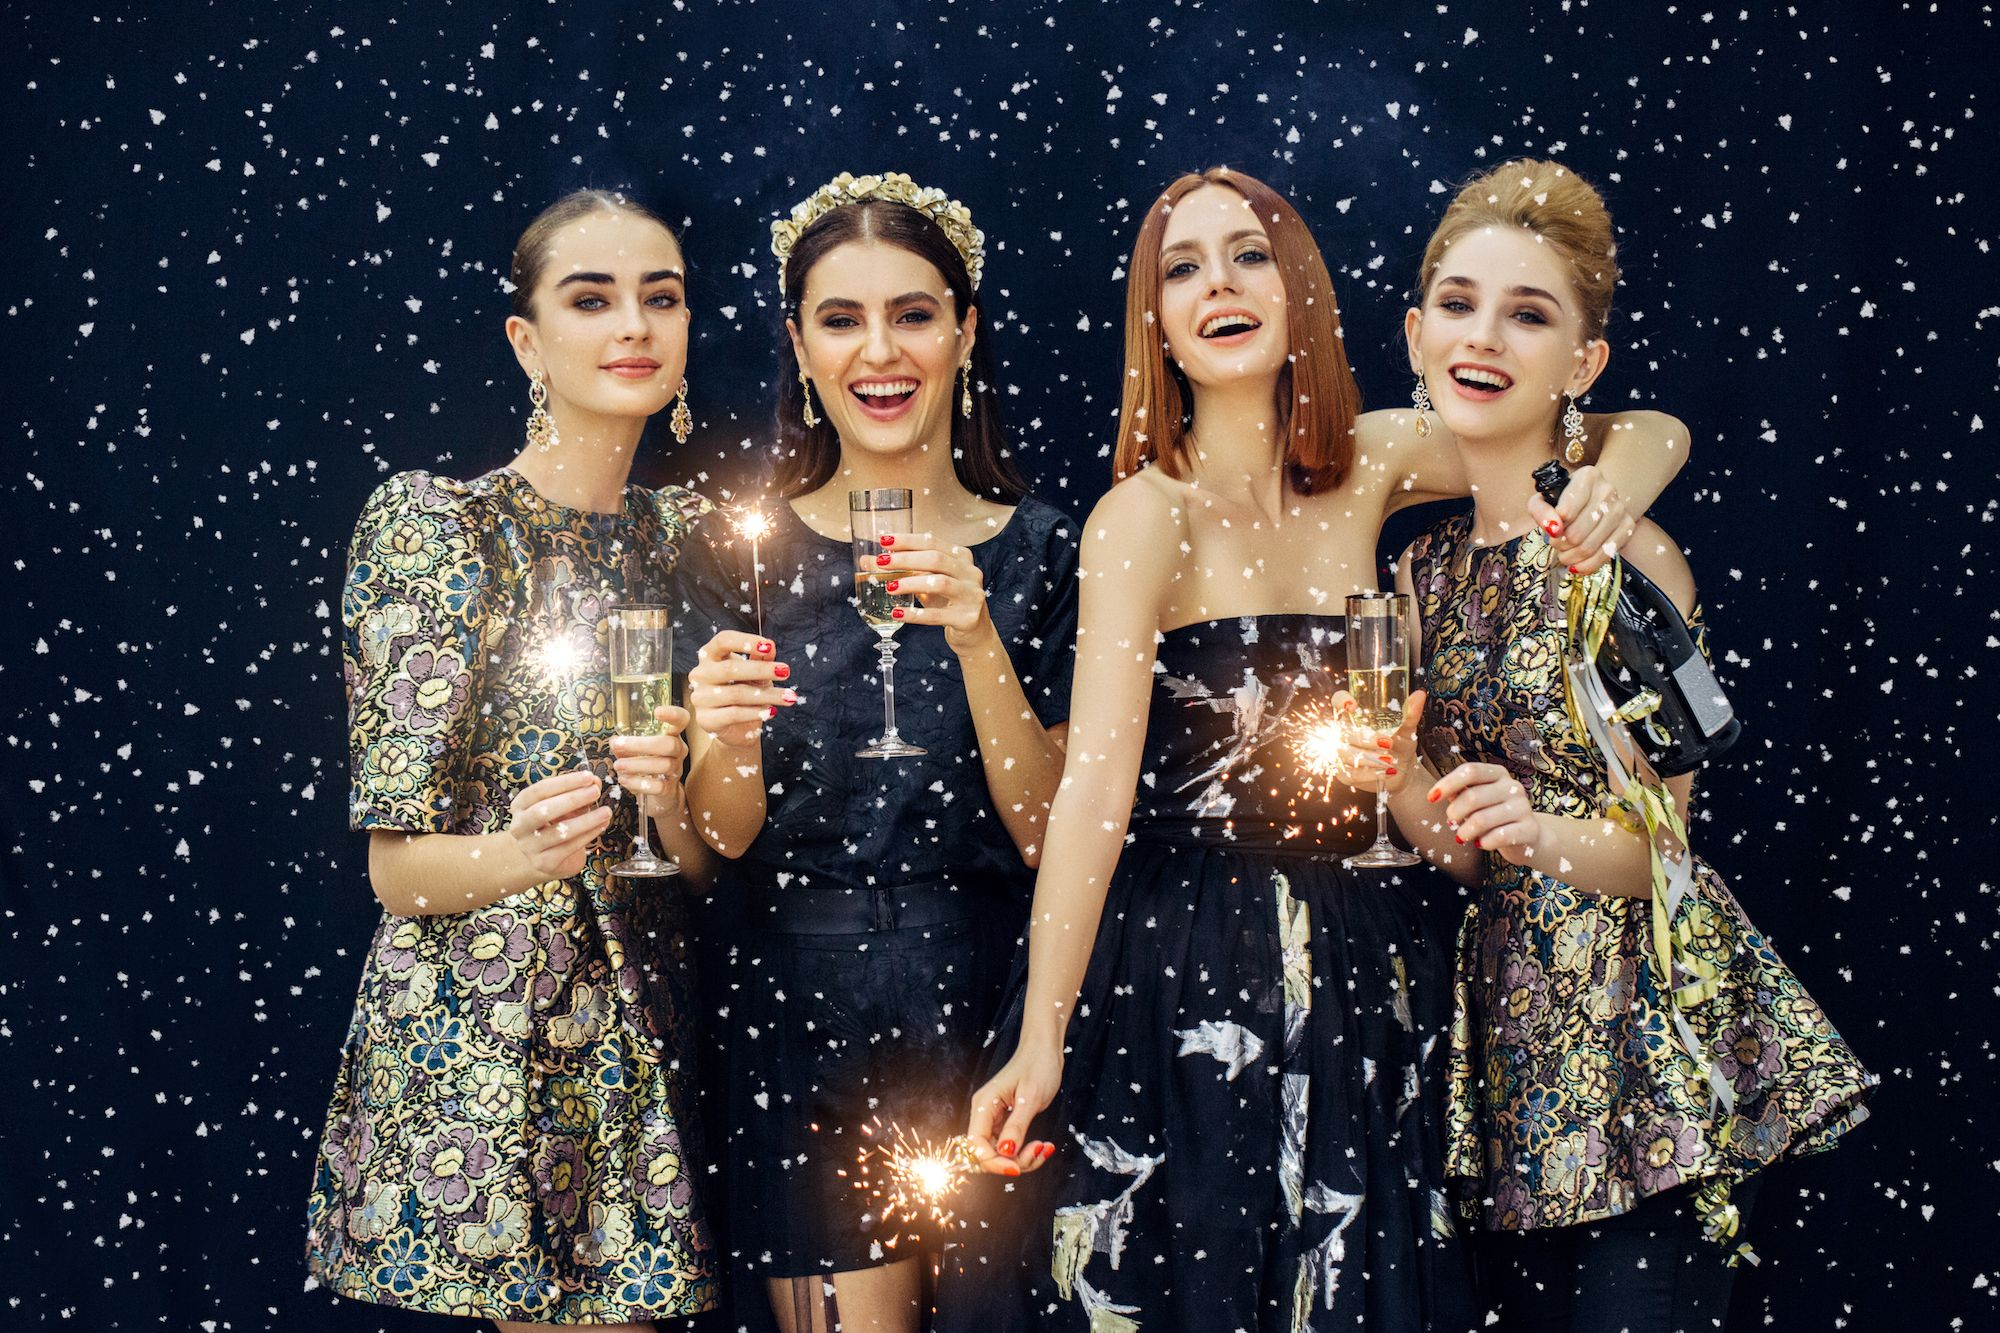 e1e3b6aeb8 Three Brilliant Ways To Host A Christmas Party Worthy Of The Fashion Crowd